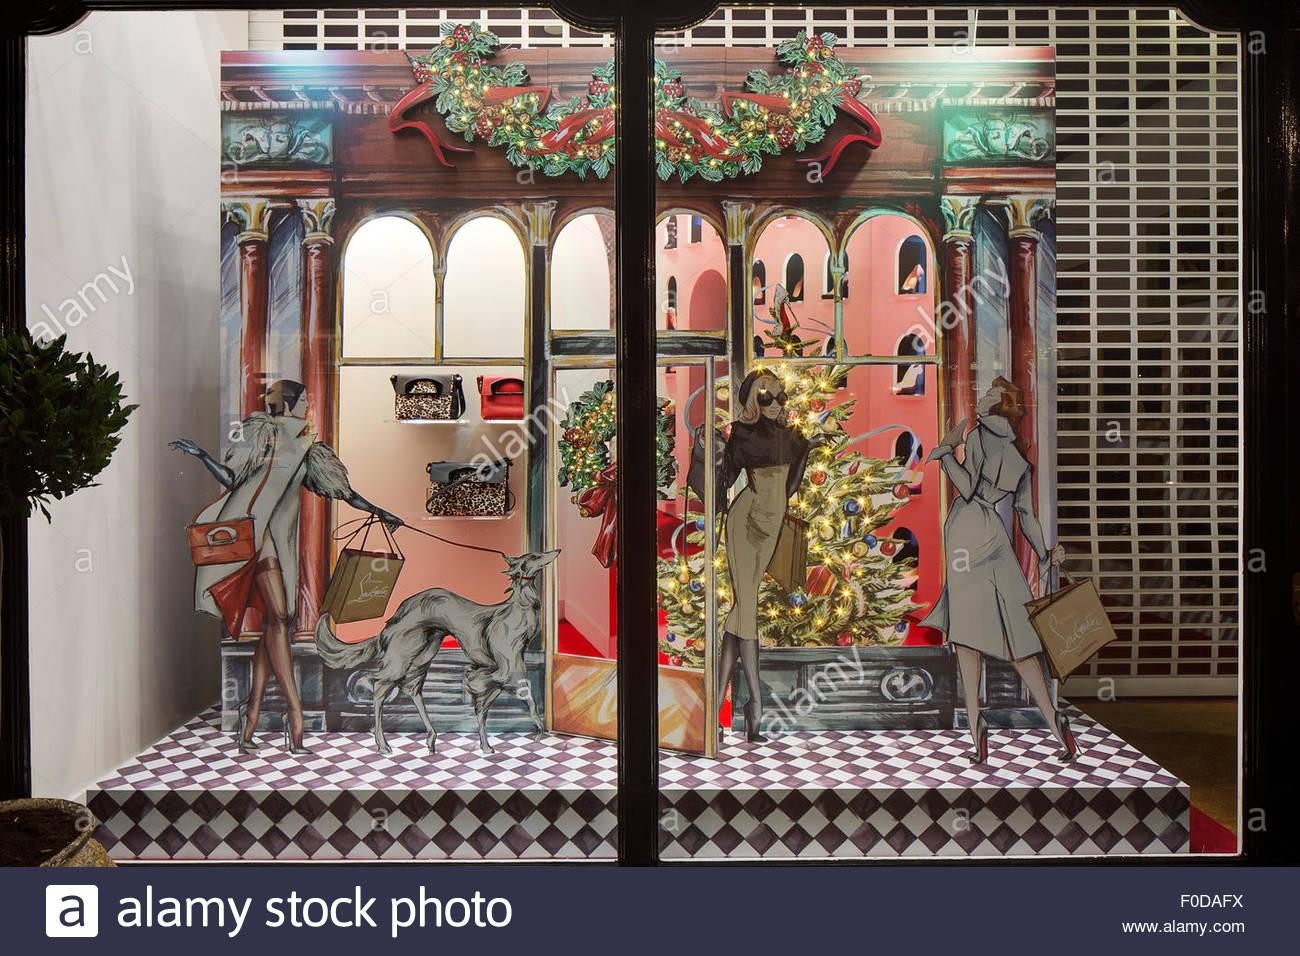 36a51f209497 Display windows. Christian Louboutin - Christmas Windows